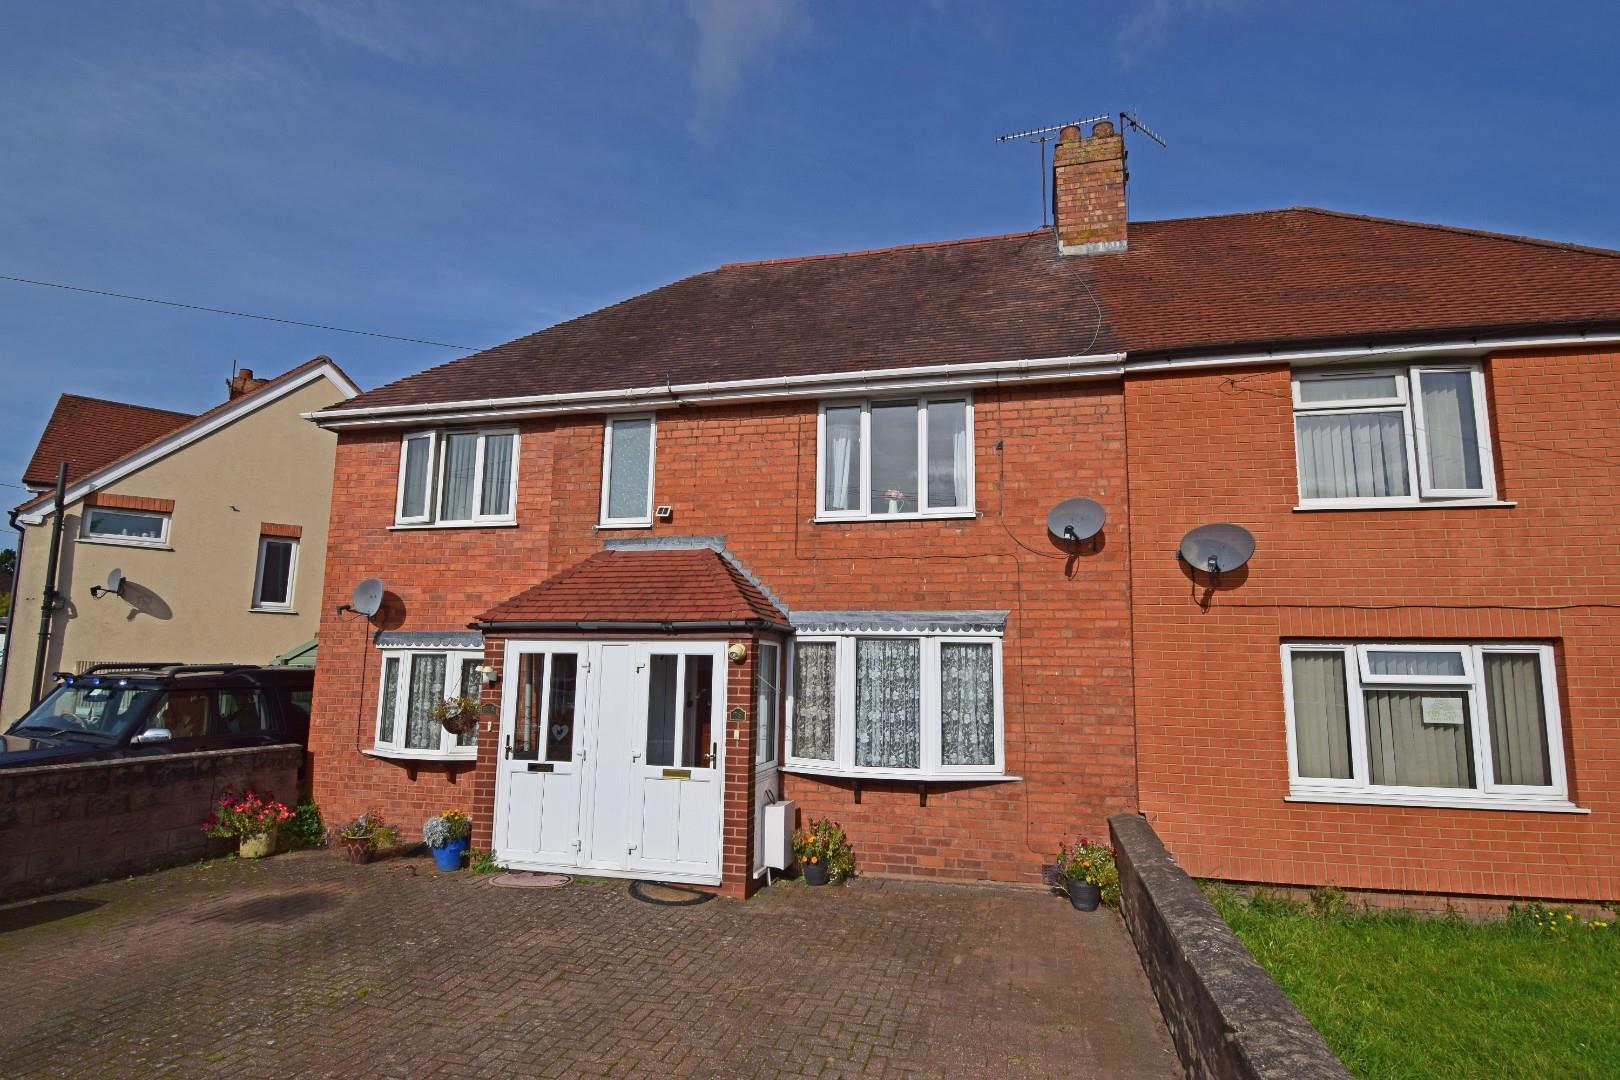 58 Churchfields Close, Bromsgrove, B61 8EE, Worcestershire